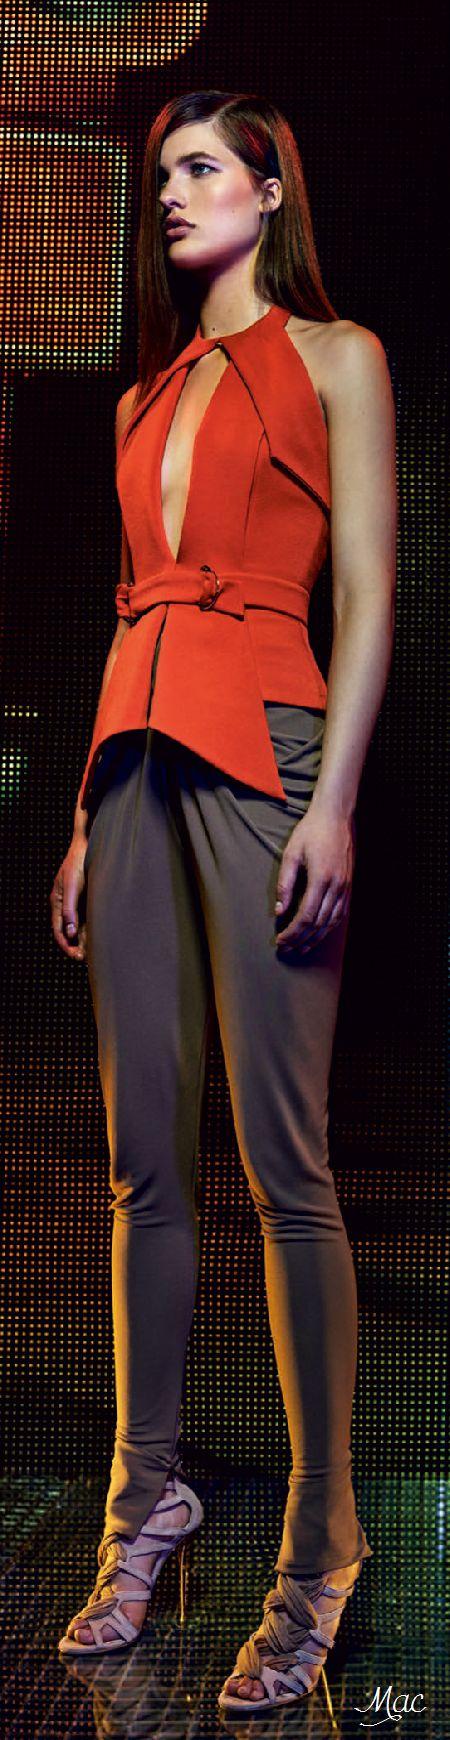 Resort 2016 Balmain women fashion outfit clothing style apparel @roressclothes closet ideas